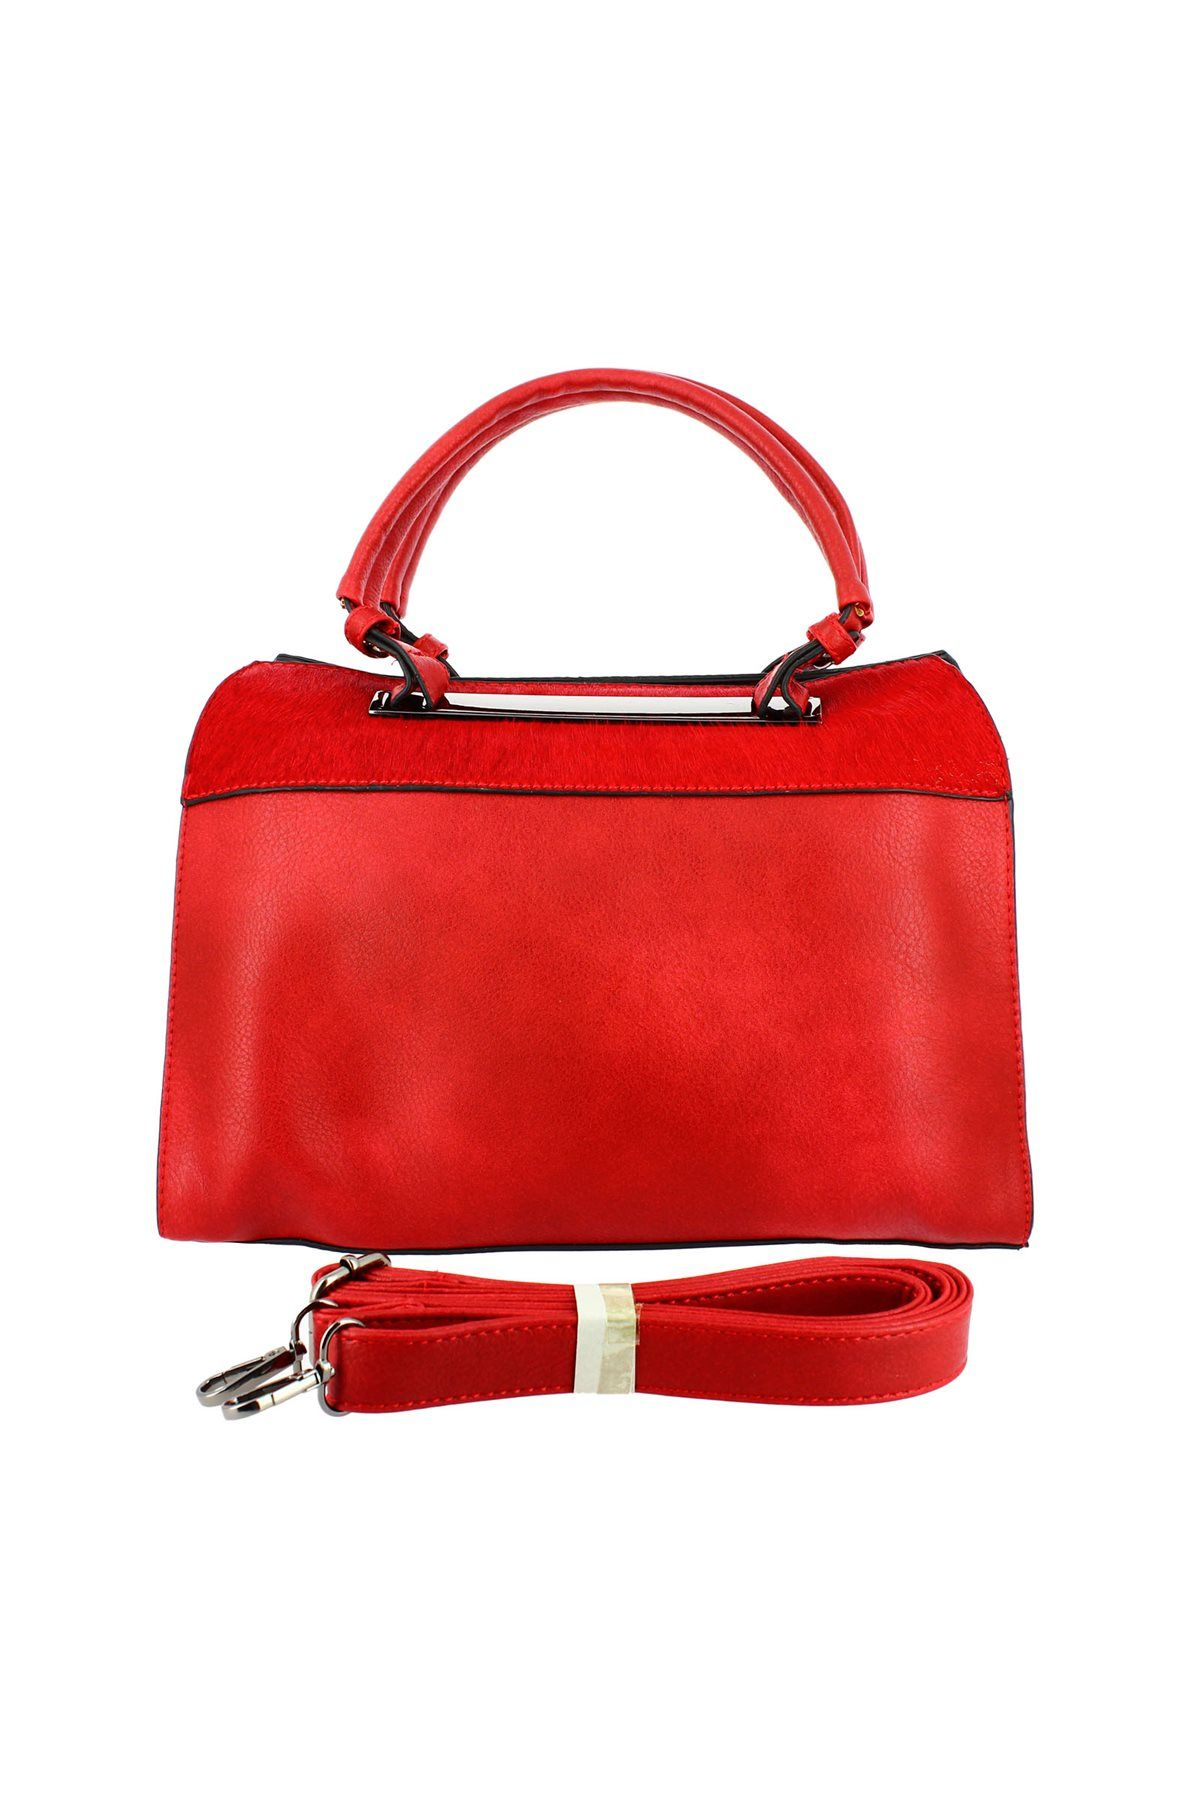 daed40b3db sac à main rouge chic - Zonedachat | A vos sacs ! di 2019 | Bags ...